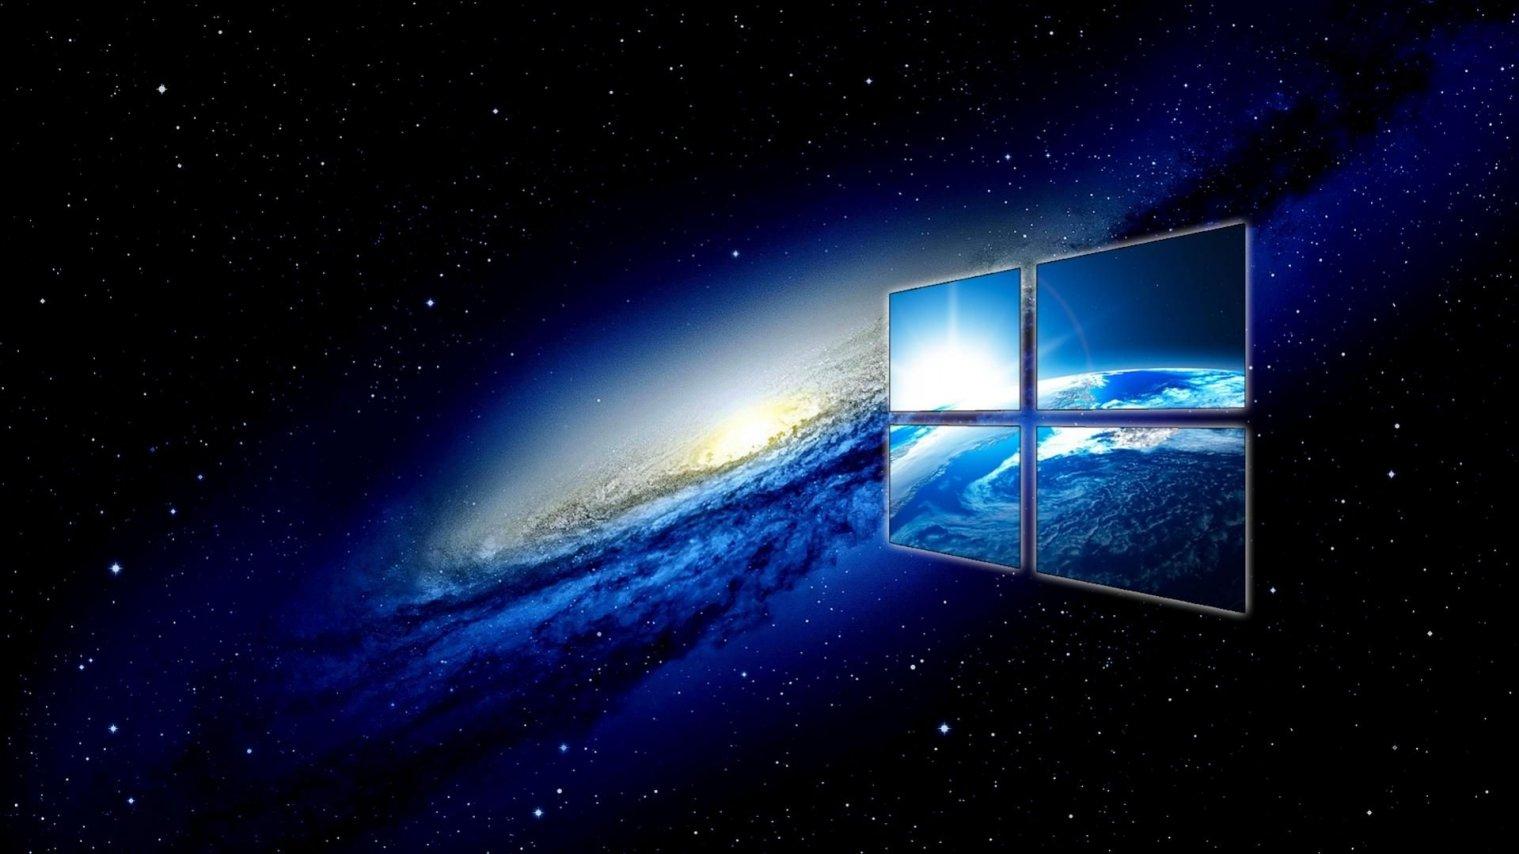 windows 10 back - Windows 10 21H1 Spring 2021 μόλις κυκλοφόρησε